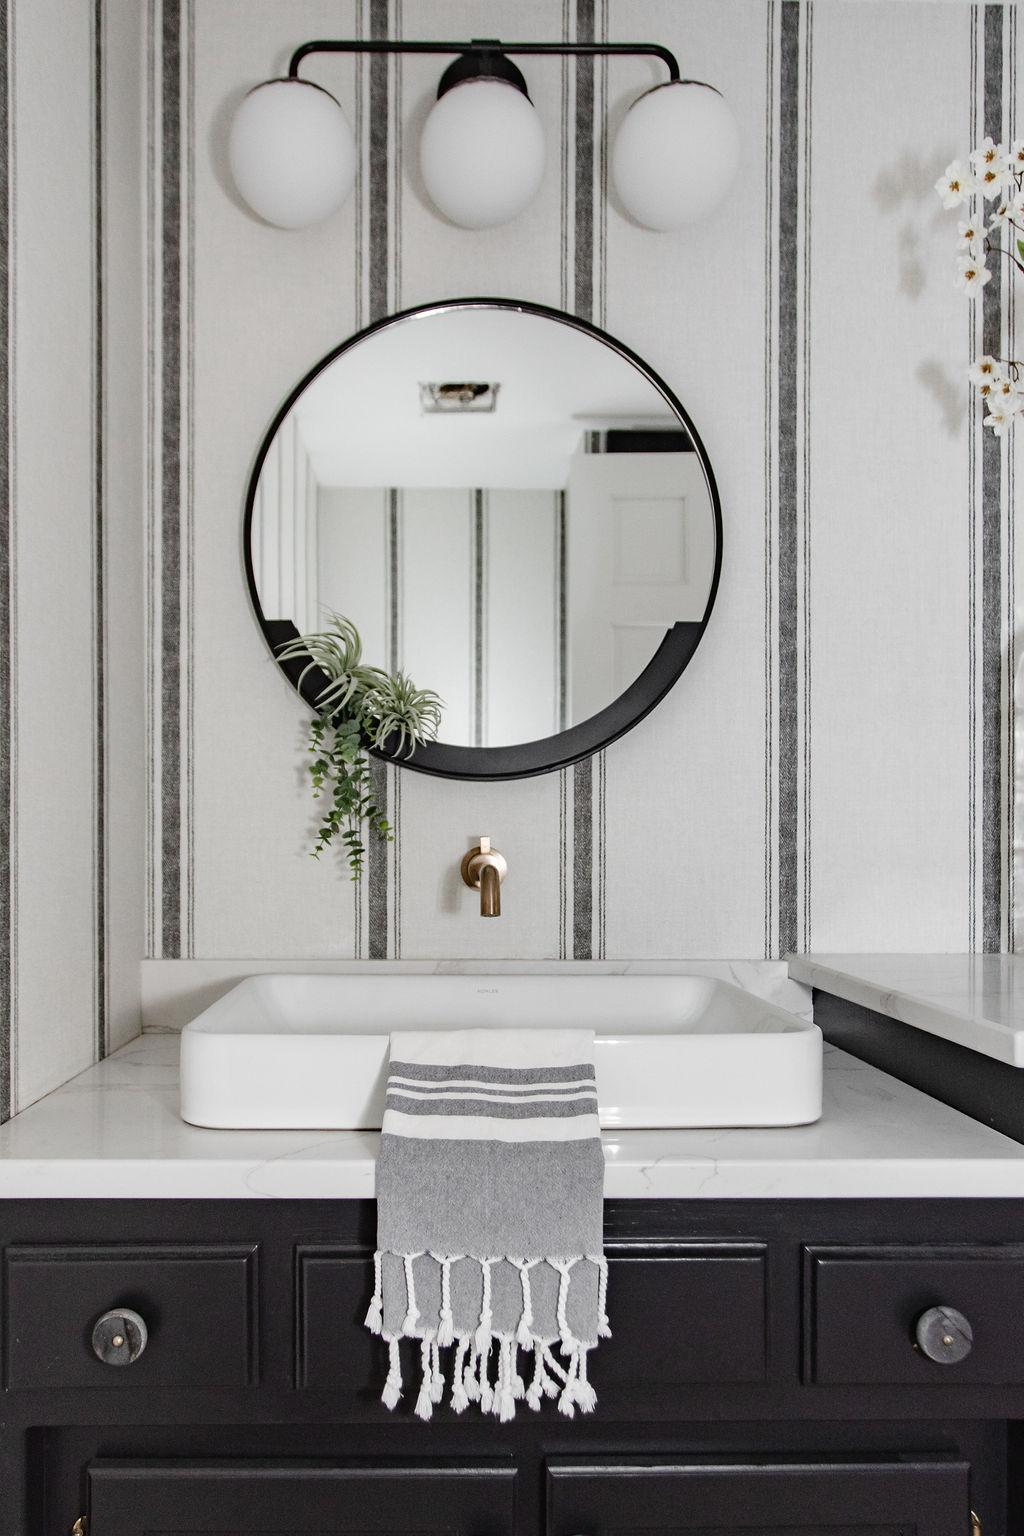 A bathroom renovation's modern take on classic black & white design